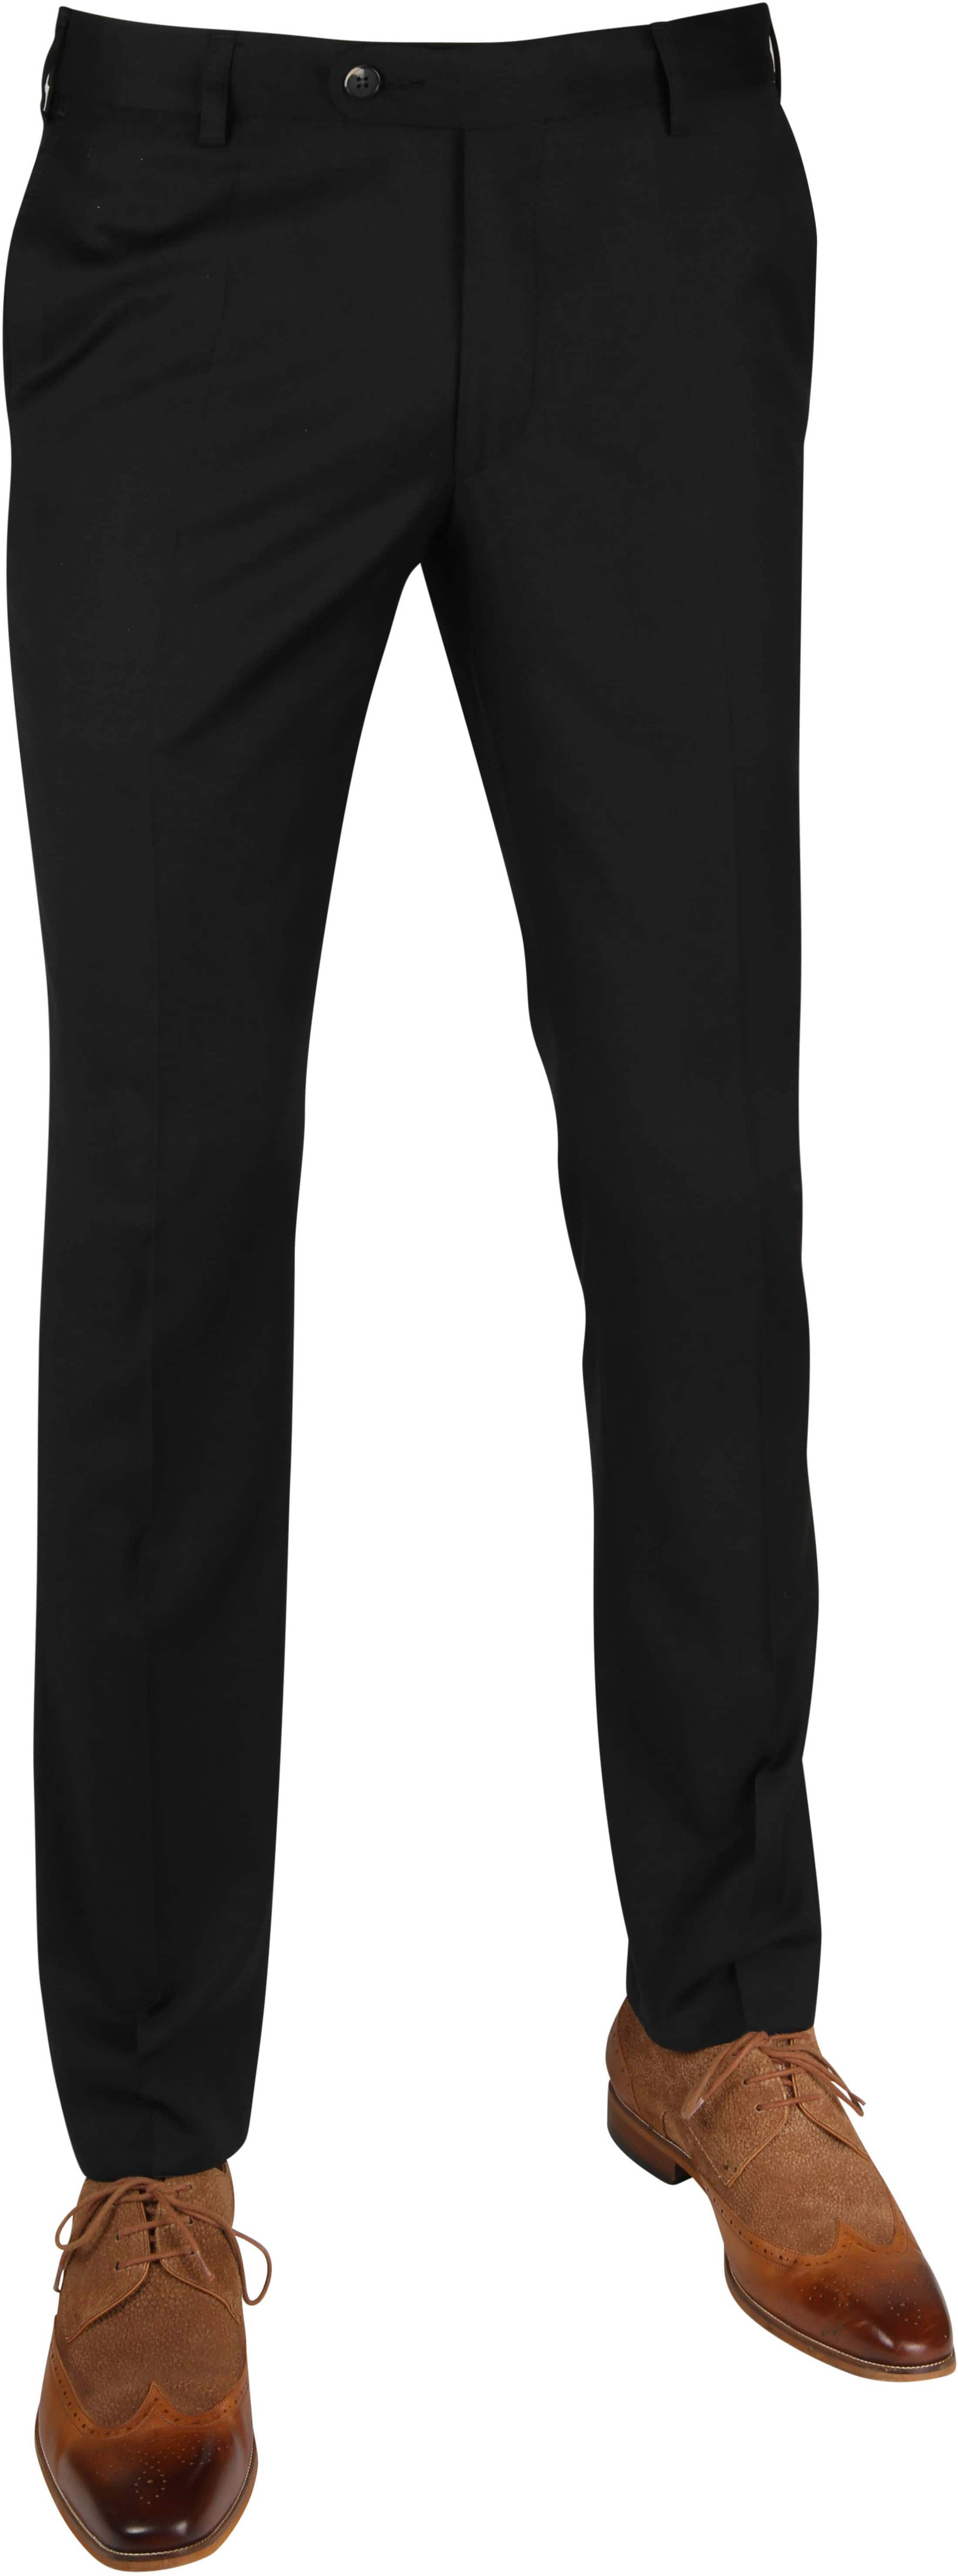 Suitable Pantalon Piga Black photo 0